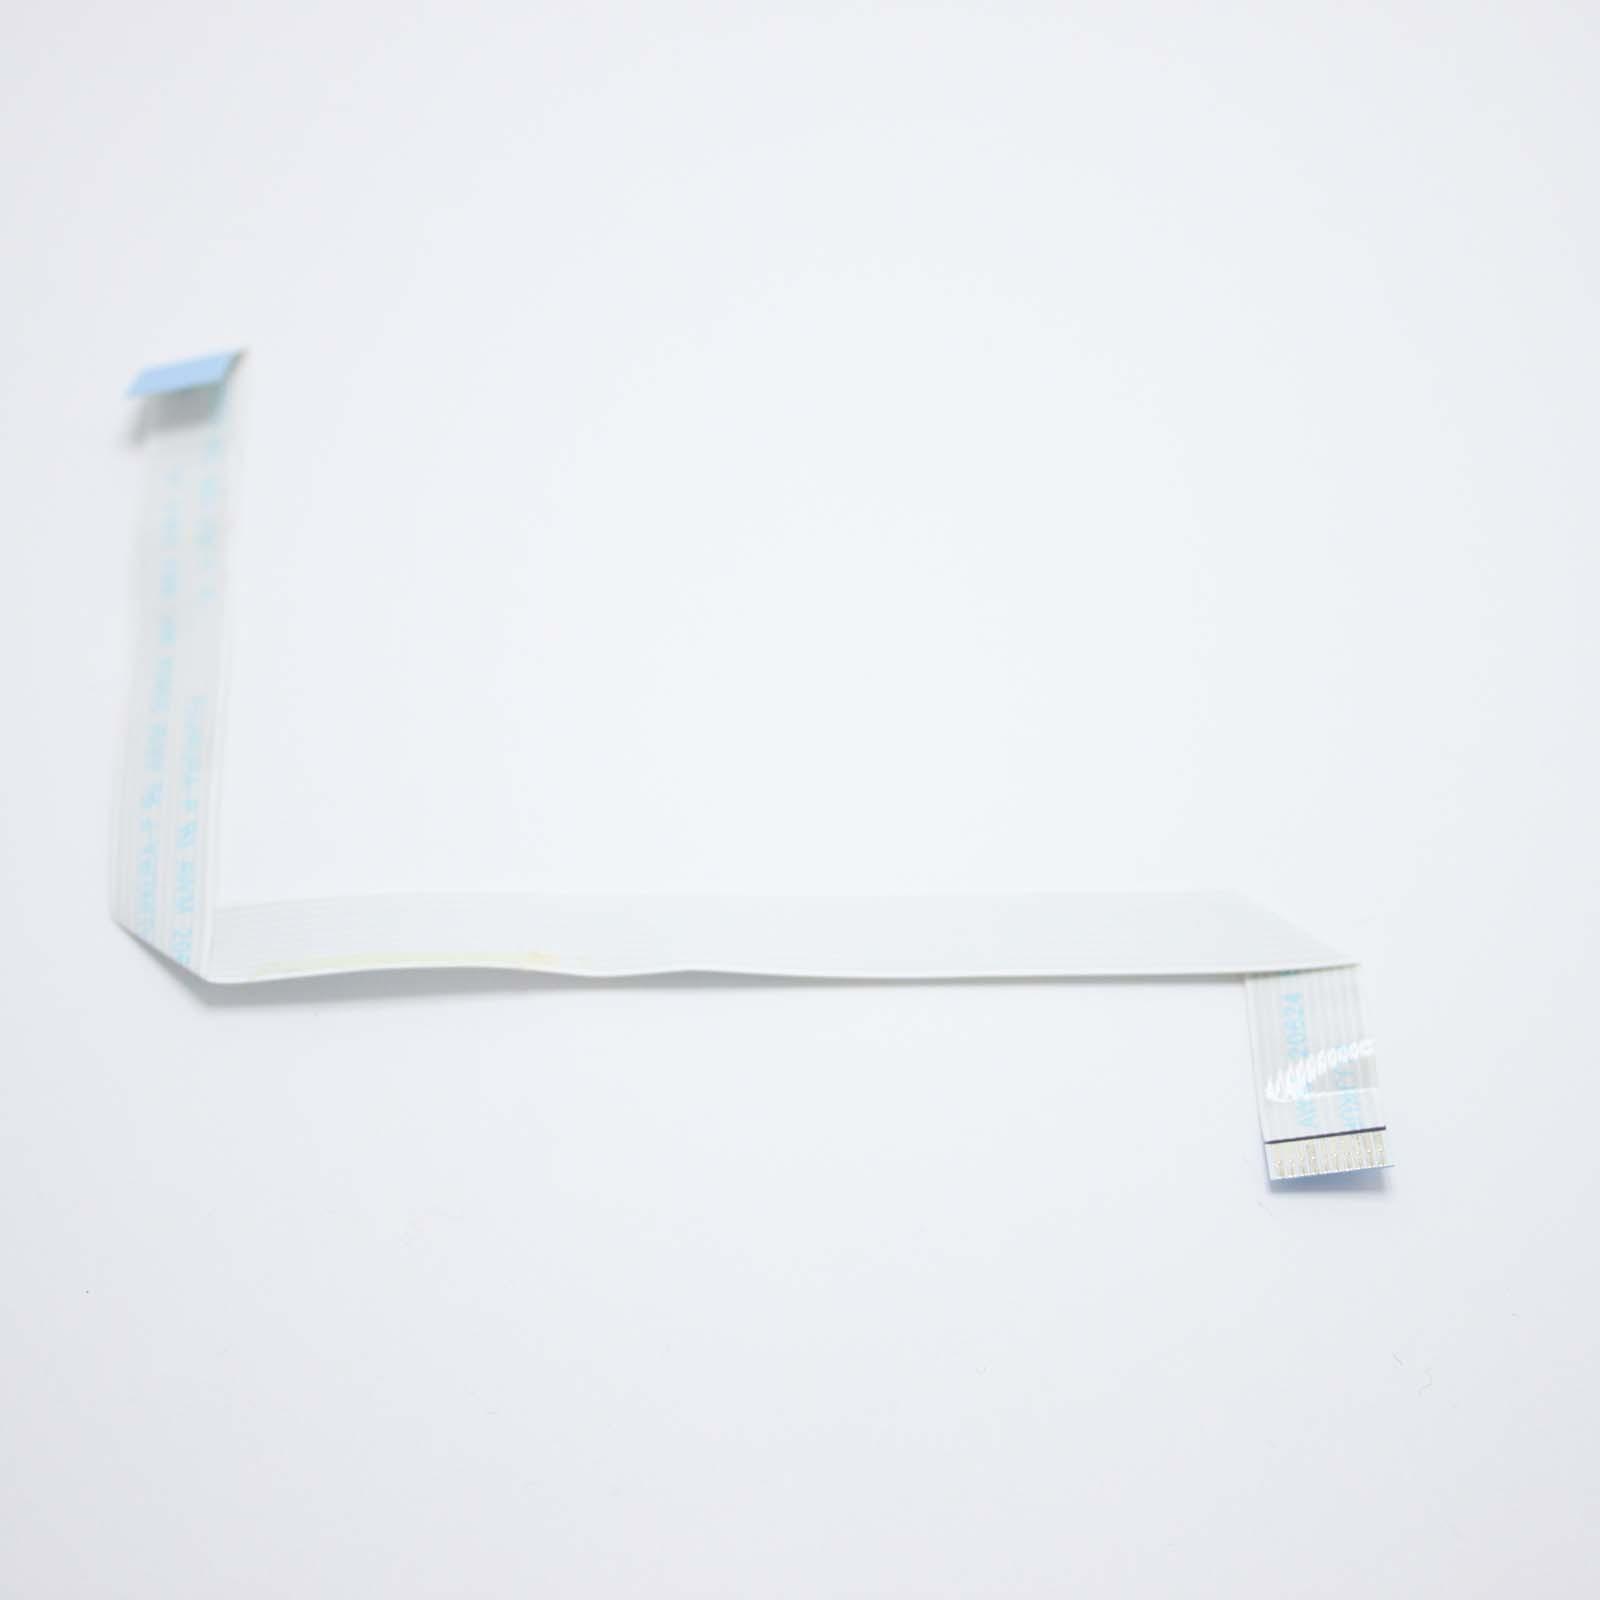 Flat touchpad to mainboard HP Pavilion ZD7000 23,5 x 11 cm 10 PIN FUJIKURA-P